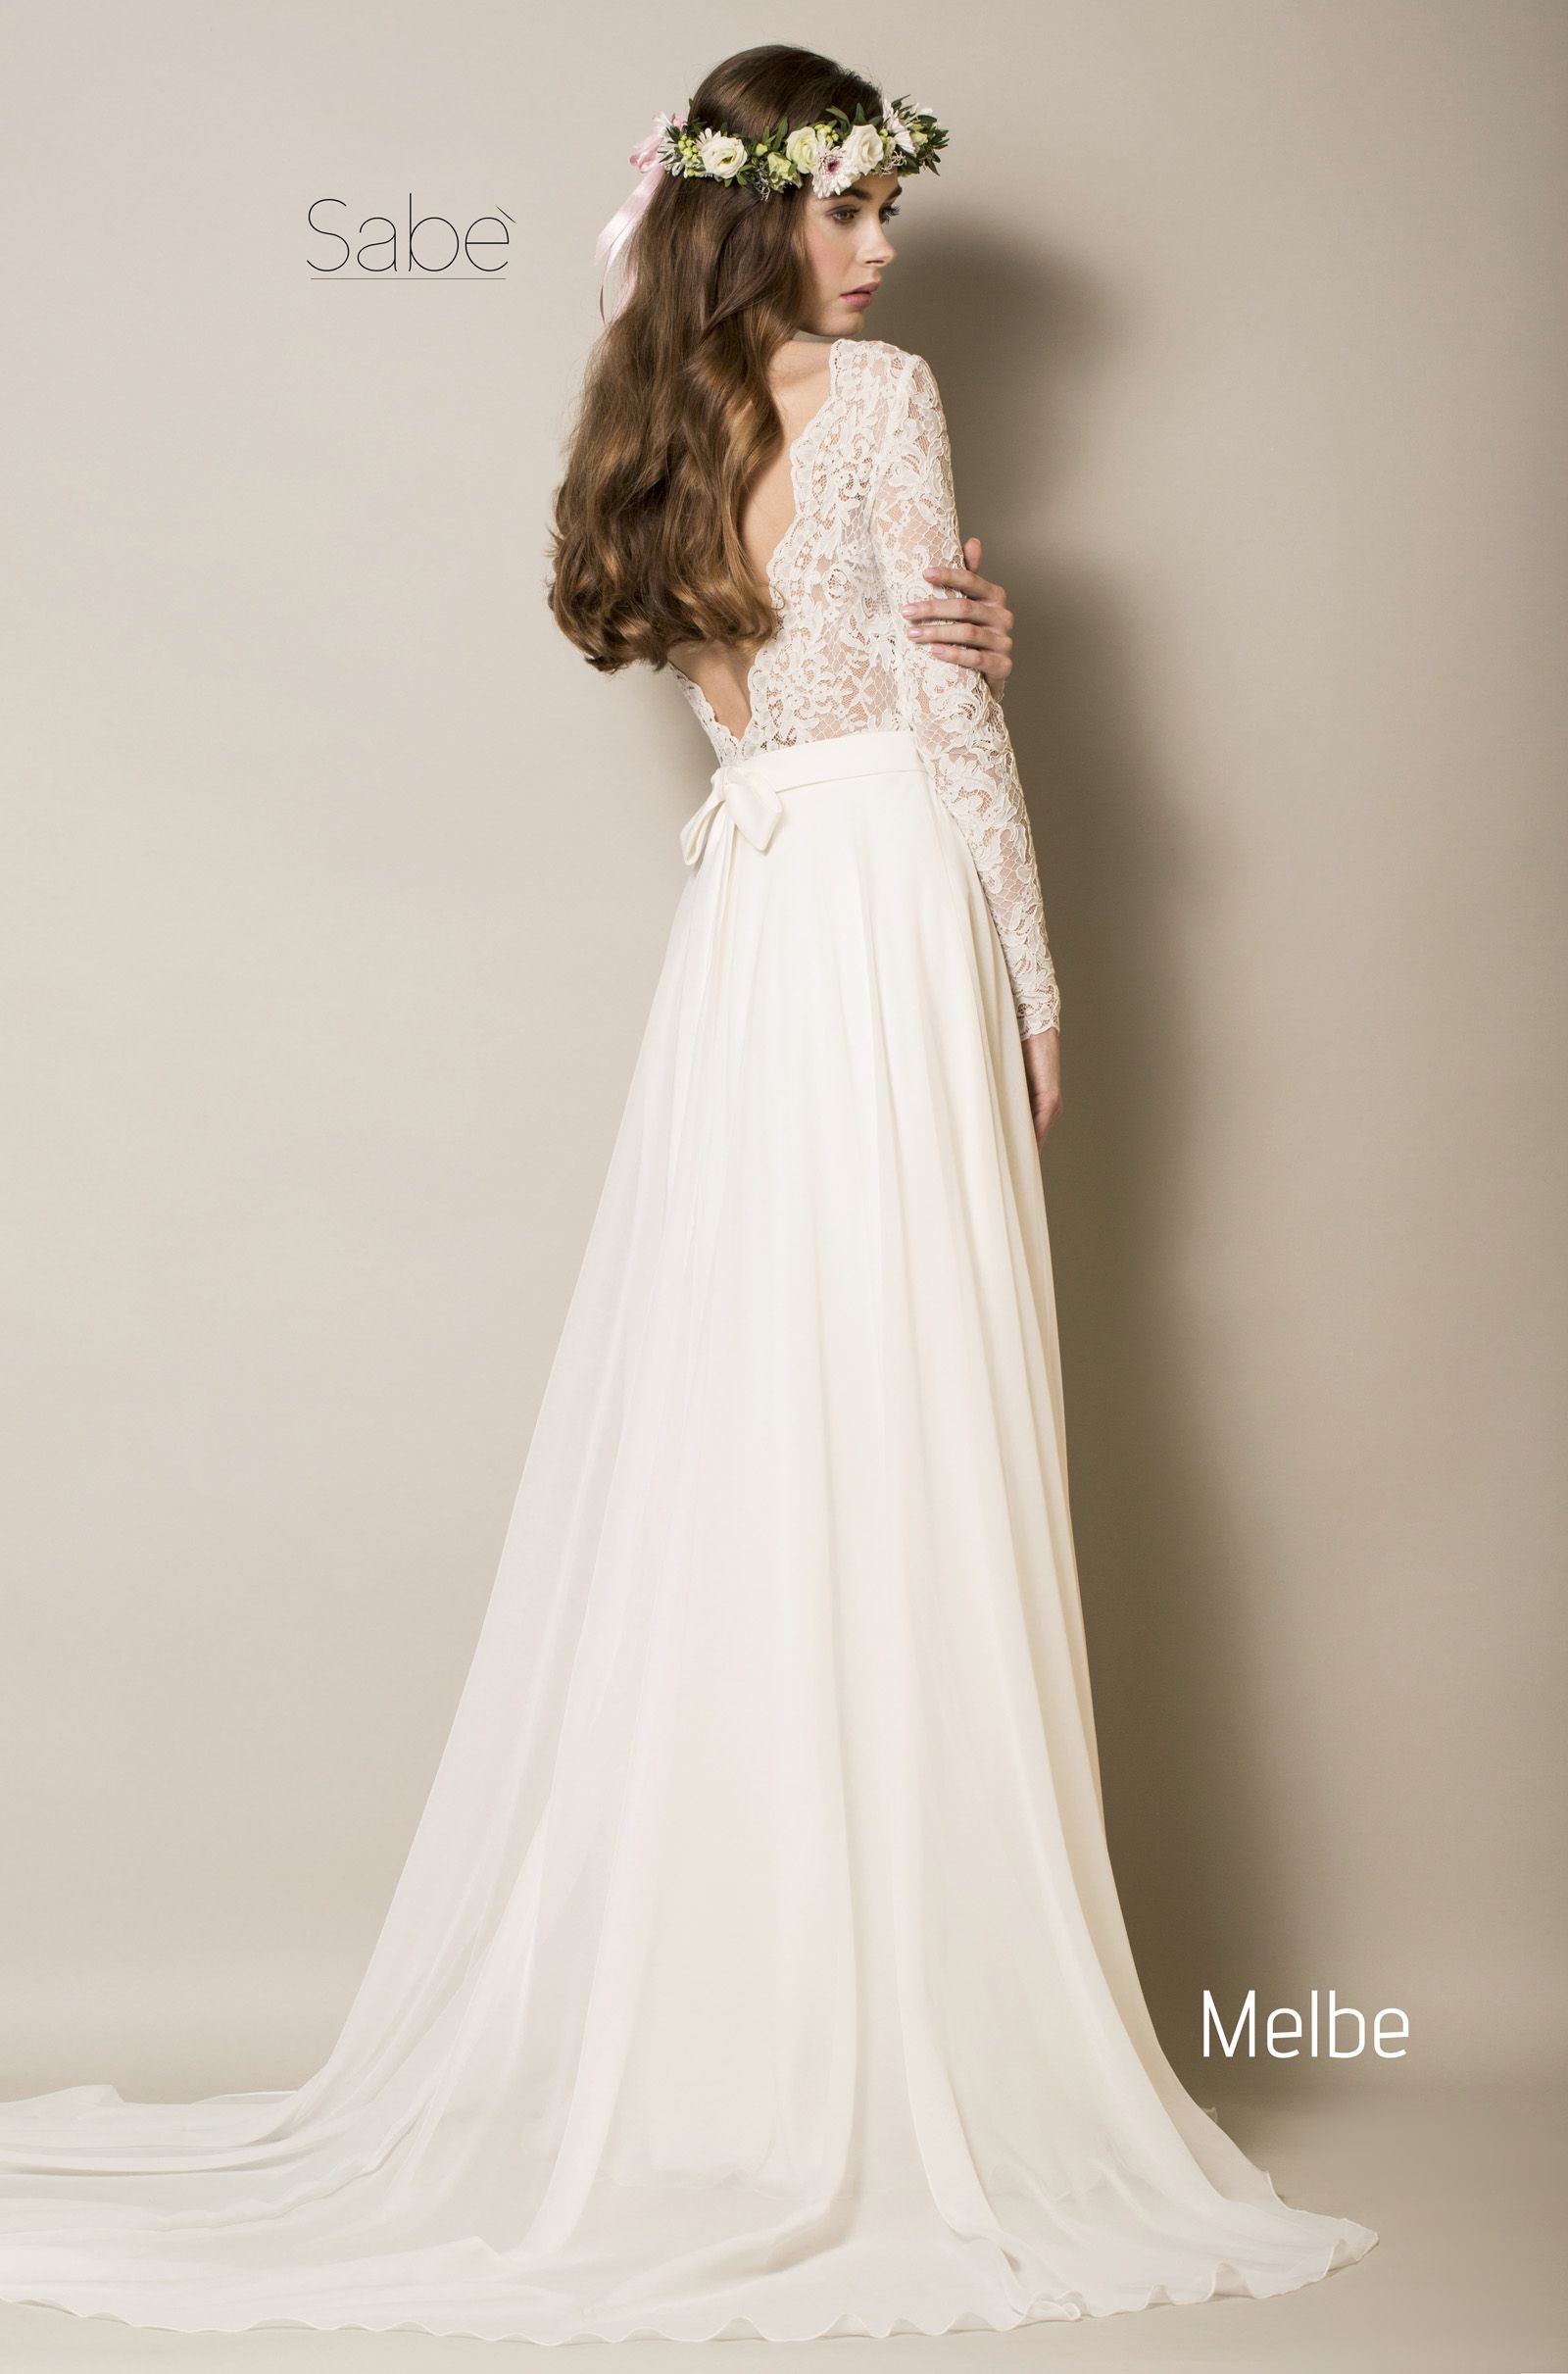 Suknia Slubna Melbe Salon Sabe 6962124469 Oficjalne Archiwum Allegro Wedding Dresses 50s Style Wedding Dress Cheap Wedding Dress